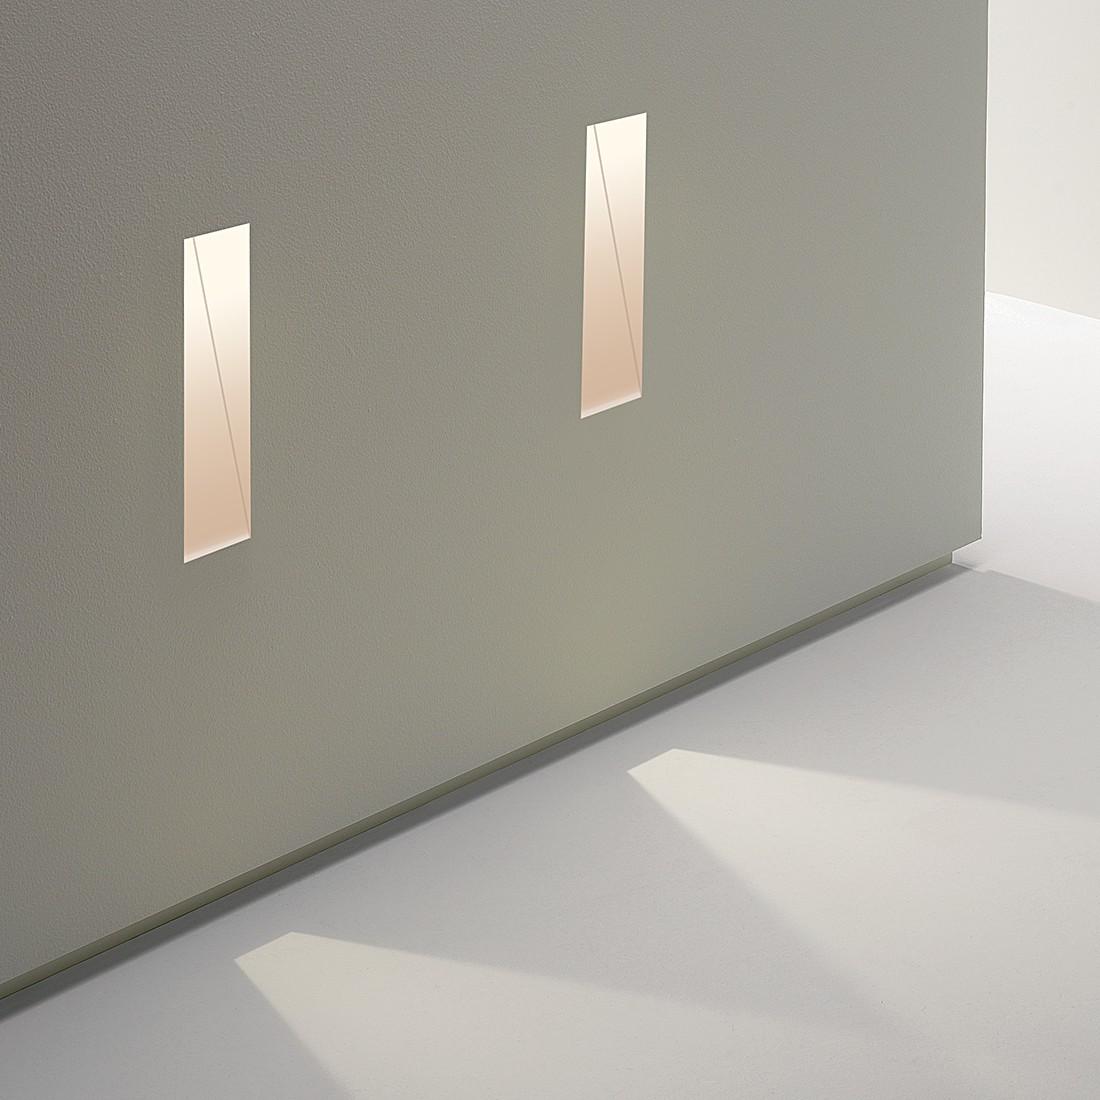 Einbauleuchte Borgo Trimless 35 ● Weiß ● 351-flammig- Illumina A+